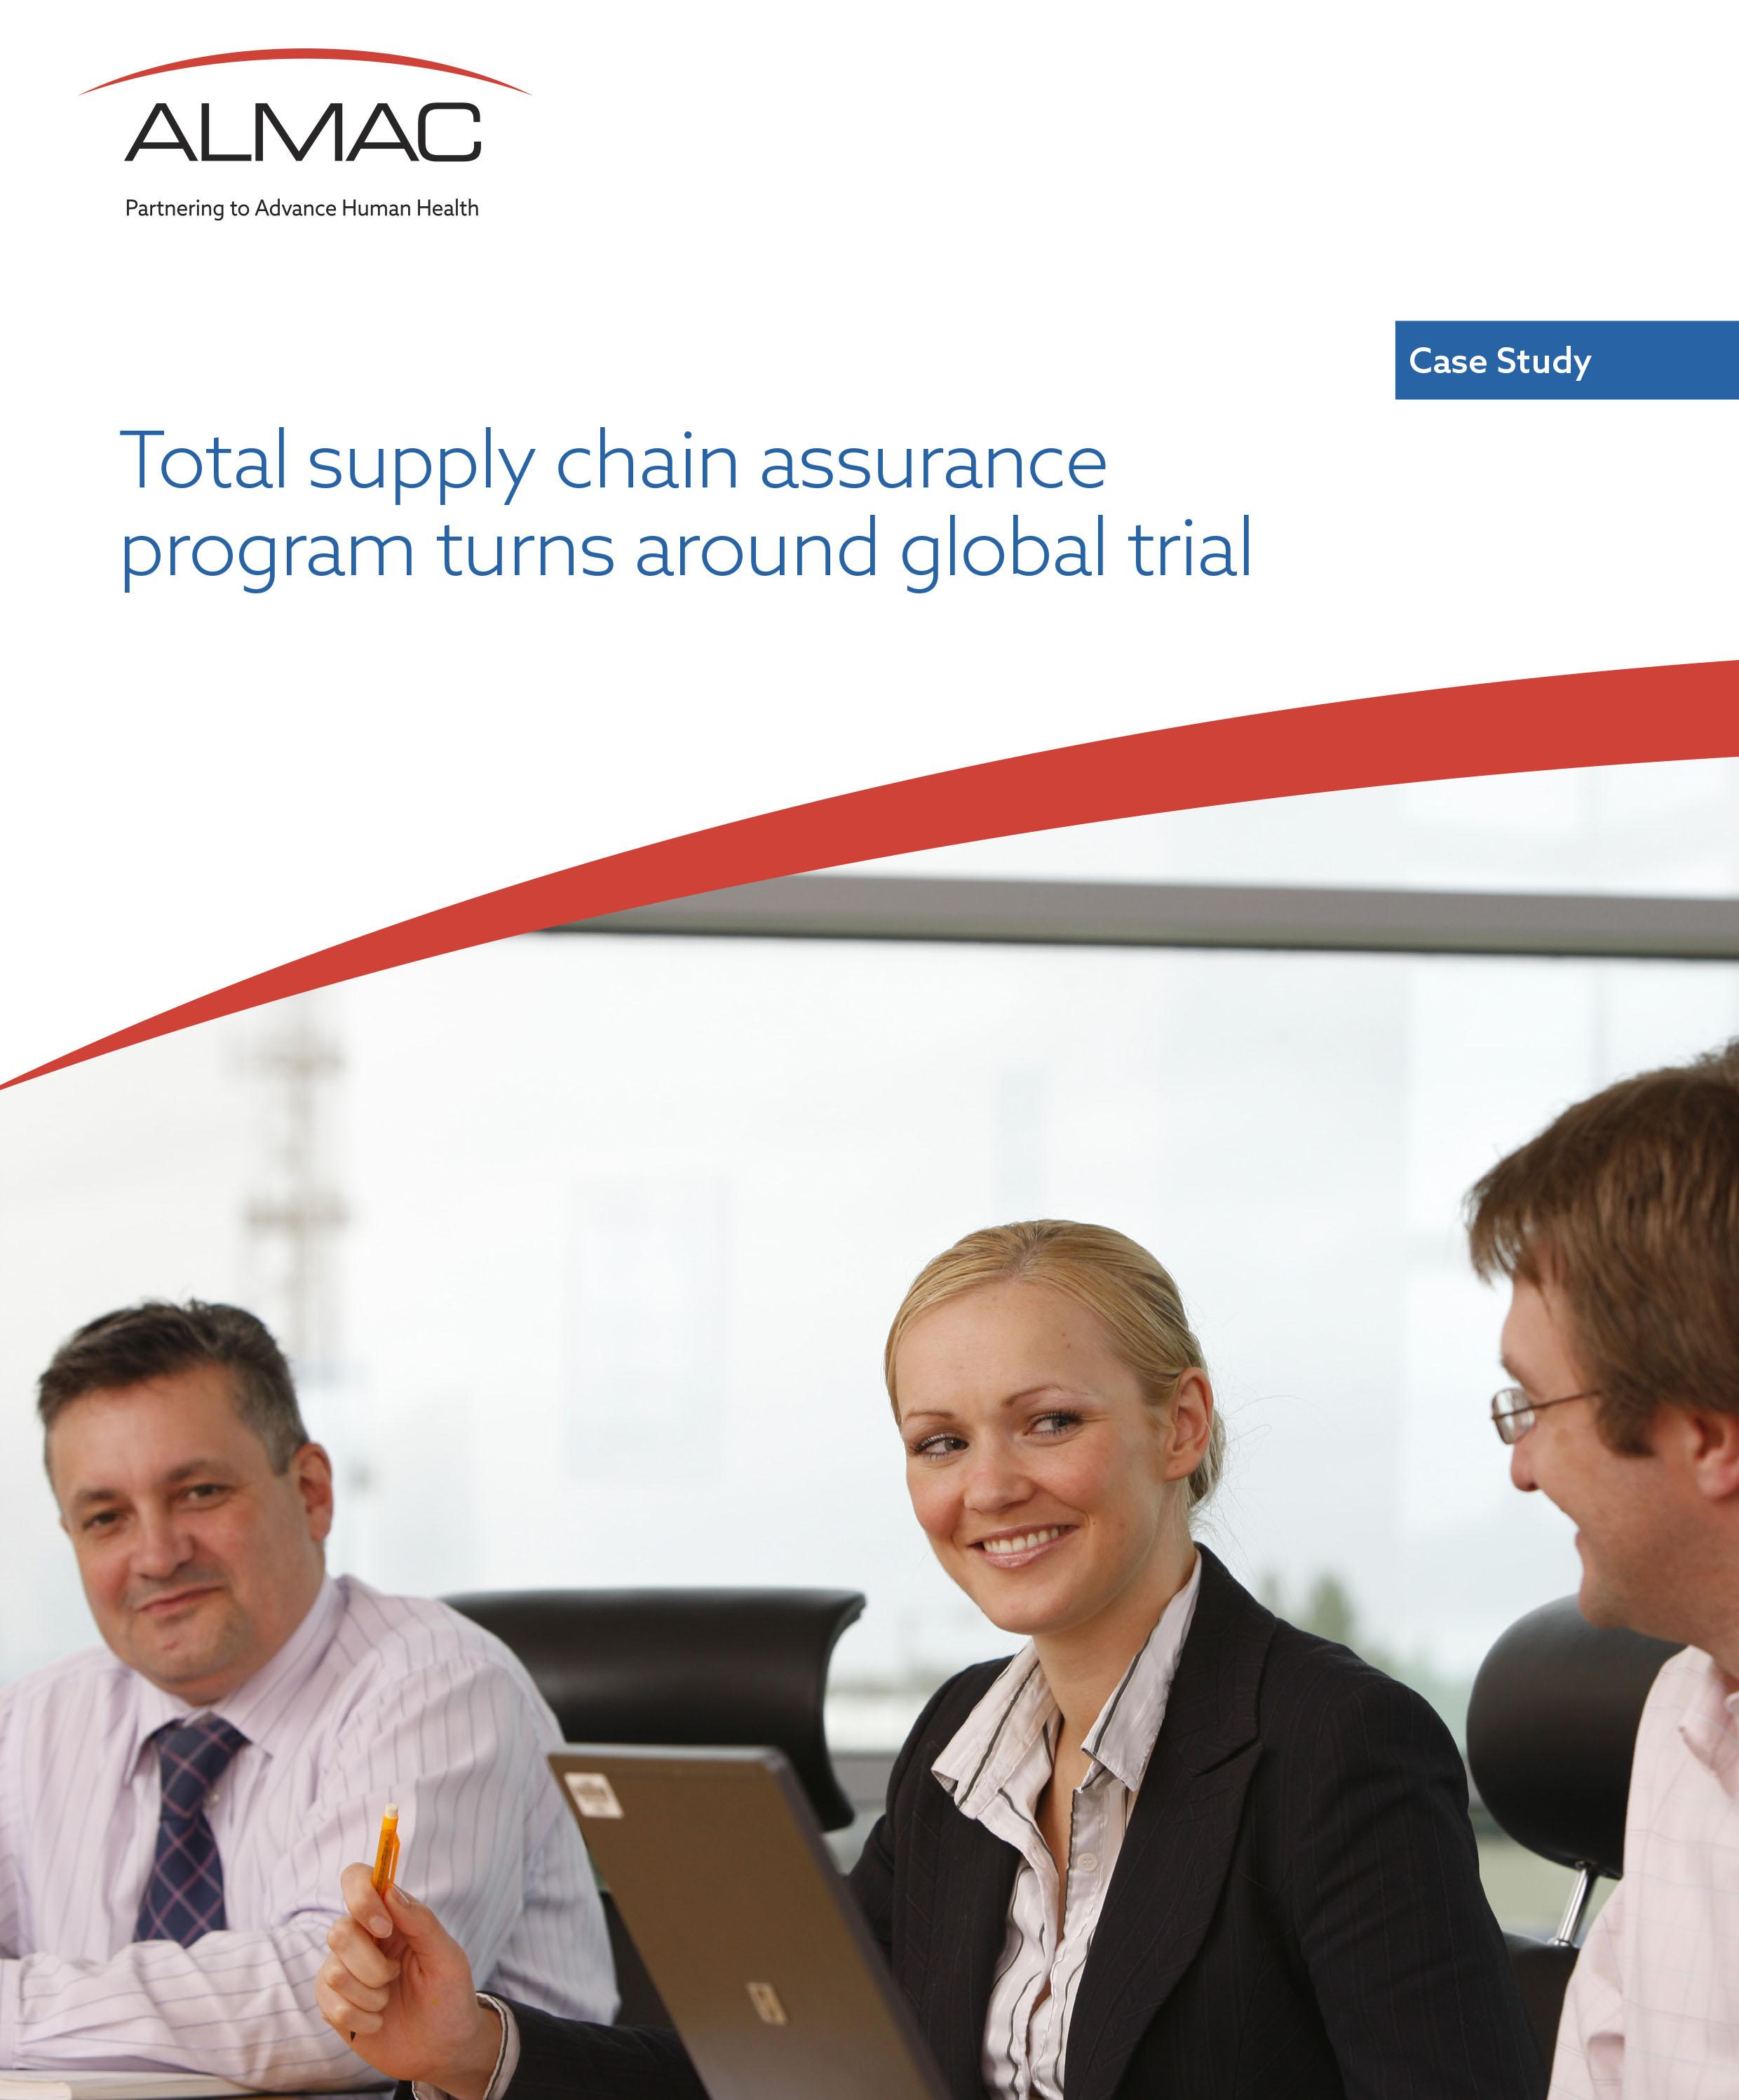 Total supply chain assurance program